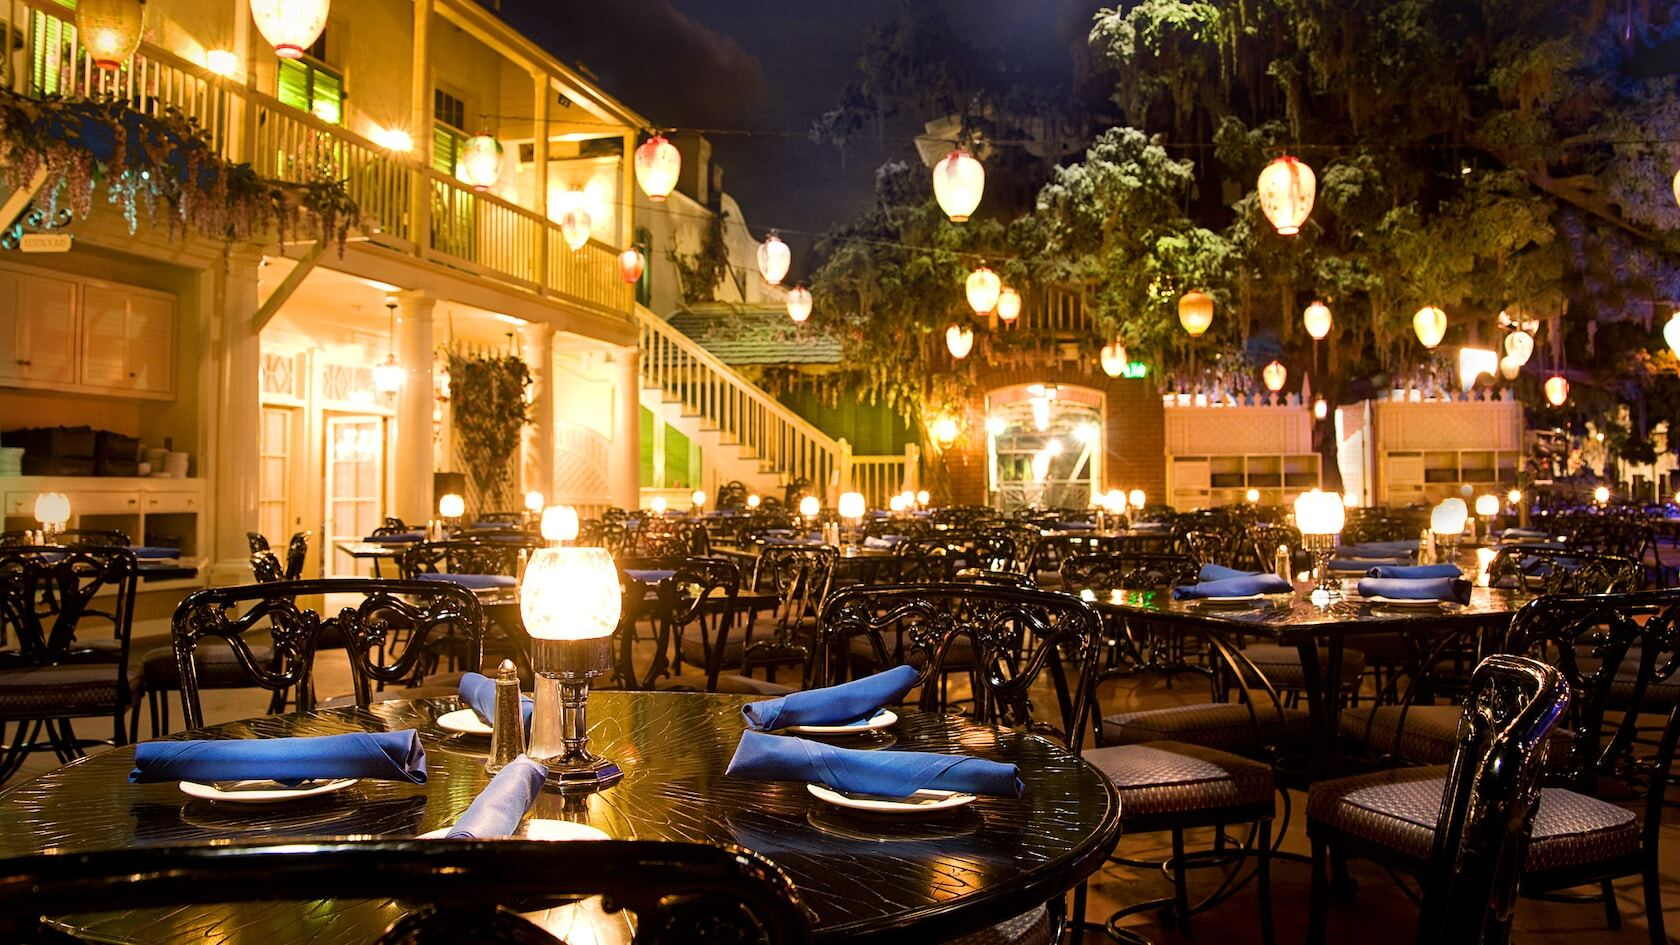 Alcohol Coming Soon To Blue Bayou Restaurant At Disneyland